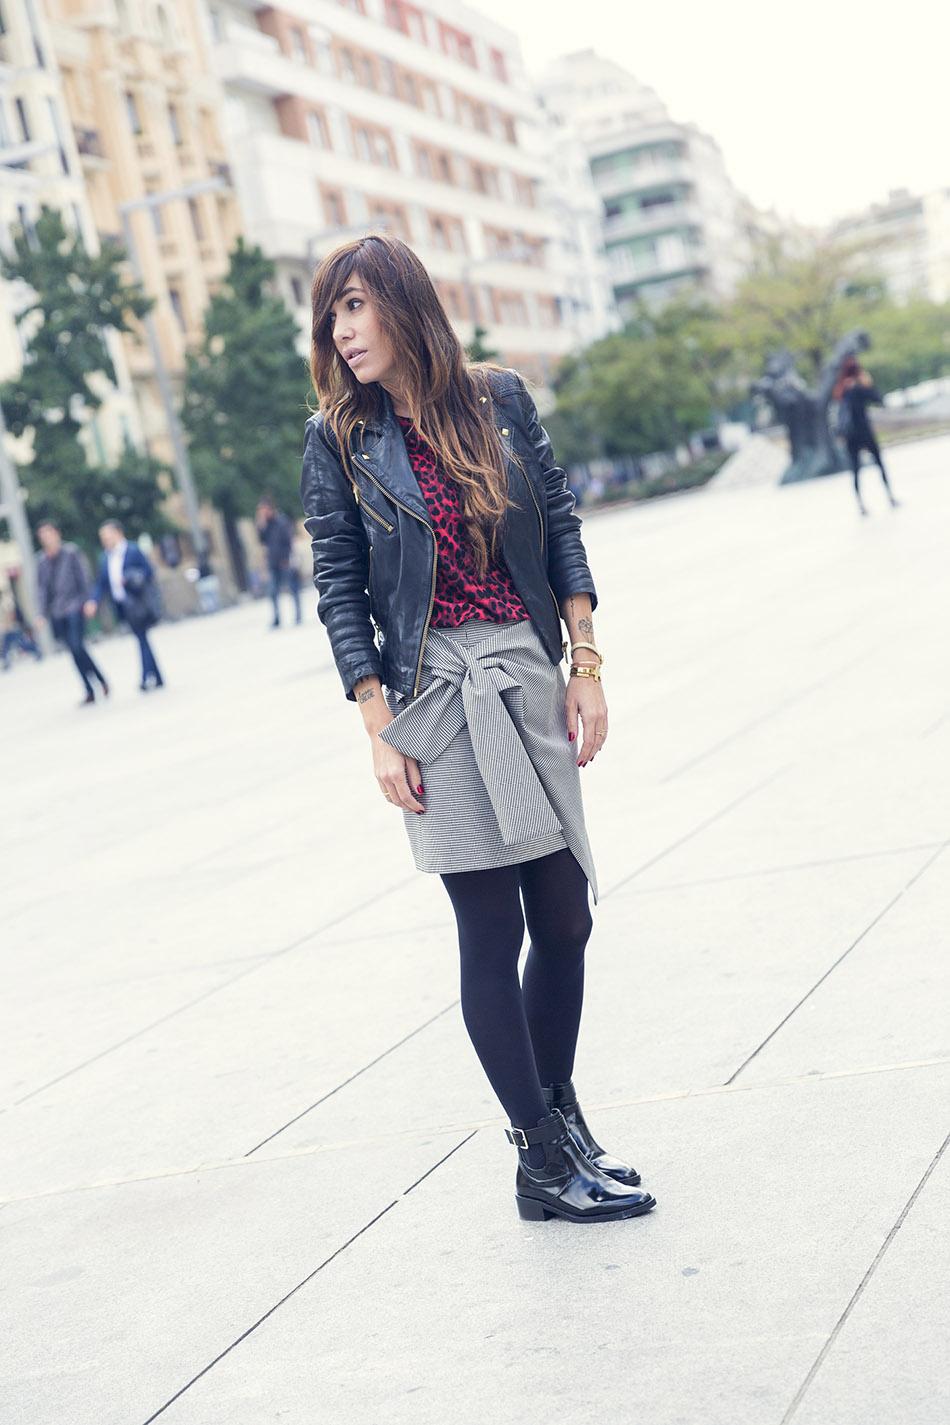 street-style-bimba-y-lola-top-zara-skirt-mango-perfecto-10